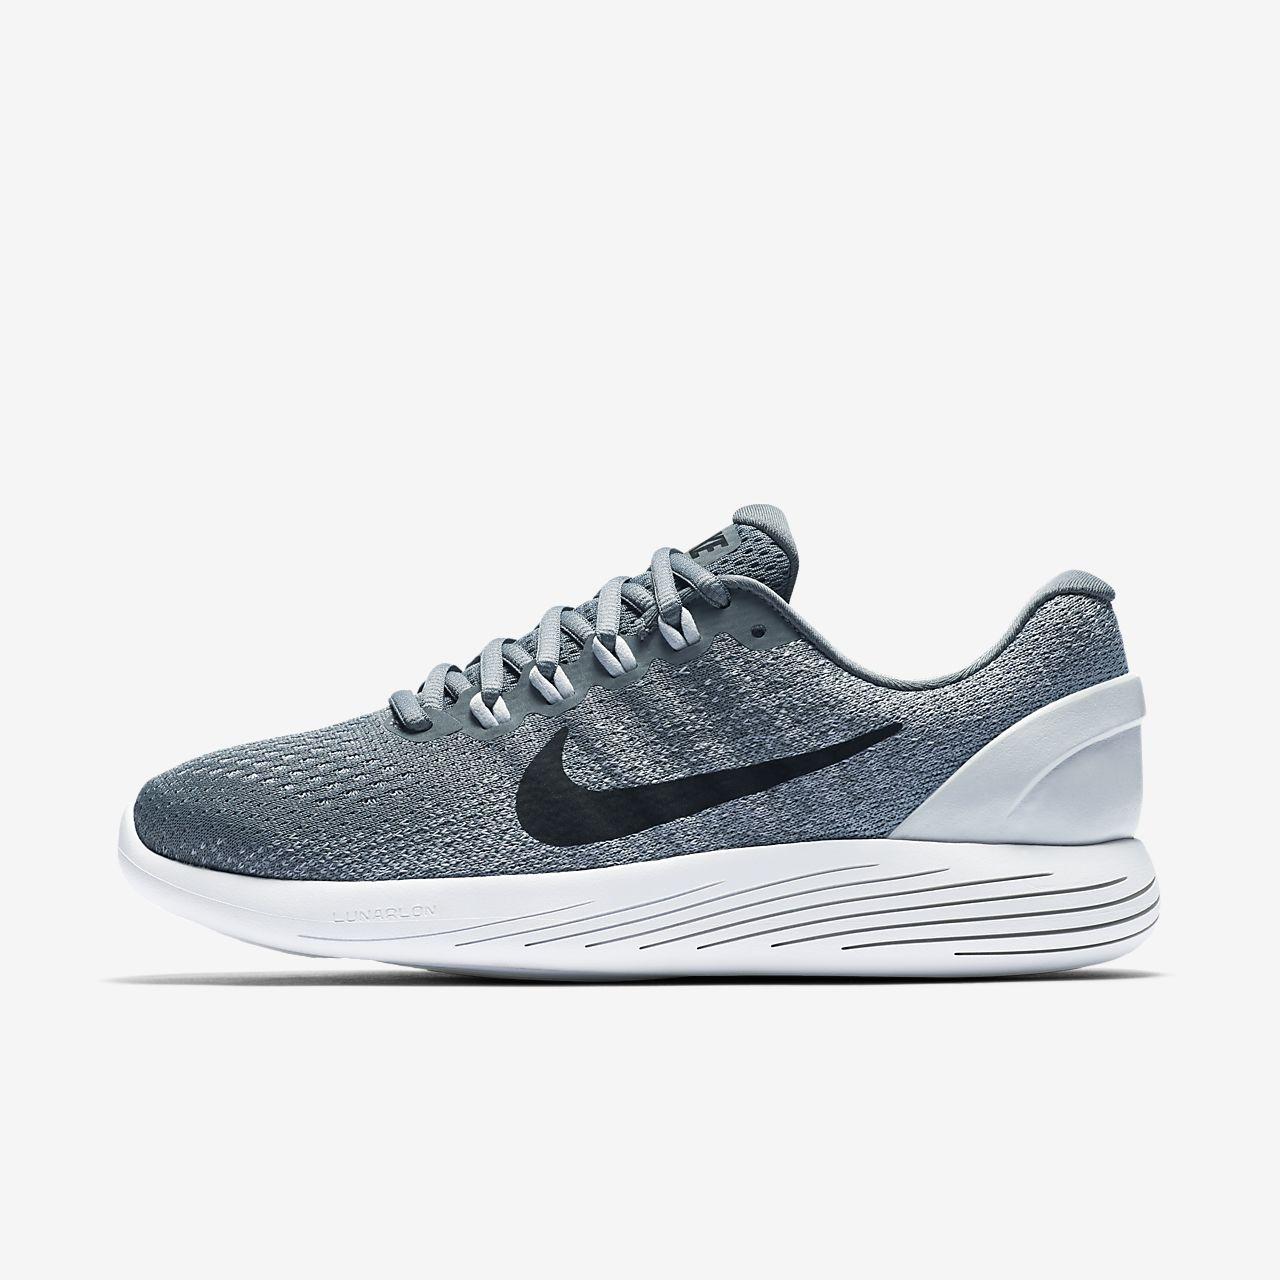 finest selection 5c6f5 88746 ... Chaussure de running Nike LunarGlide 9 pour Femme